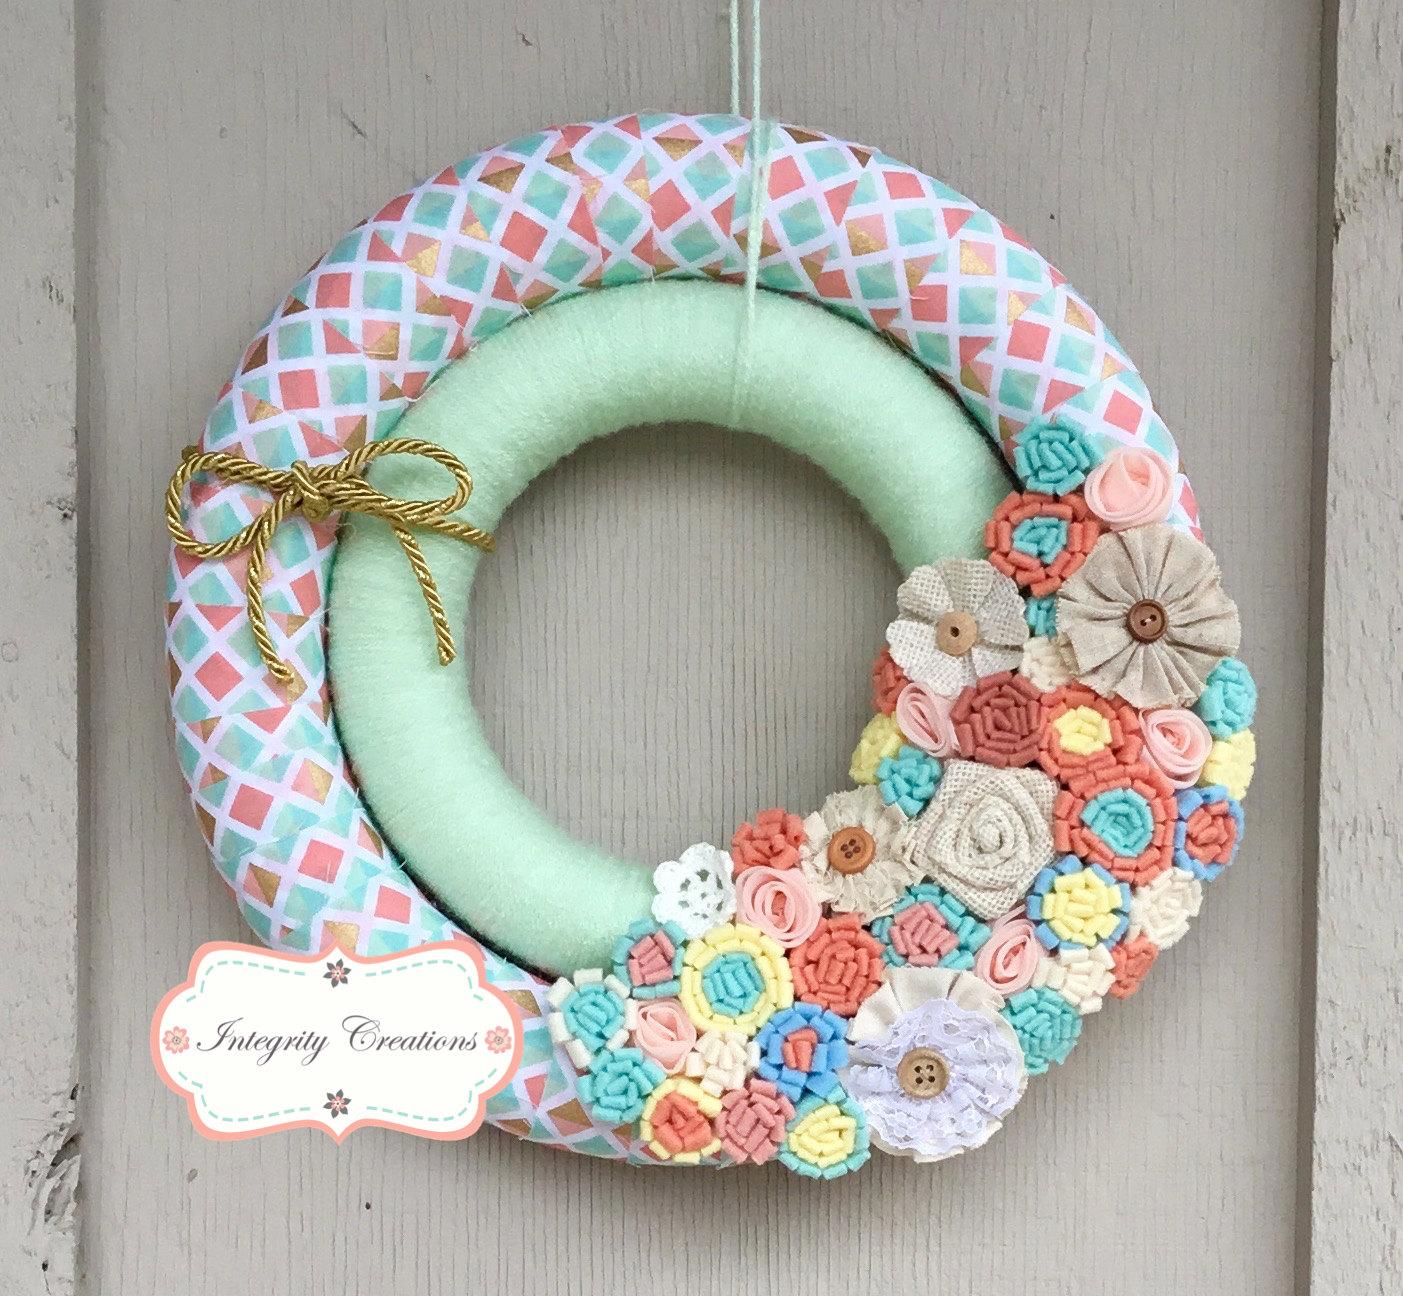 Home Design Ideas Handmade: 15 Joyful Handmade Spring Wreath Ideas To Decorate Your